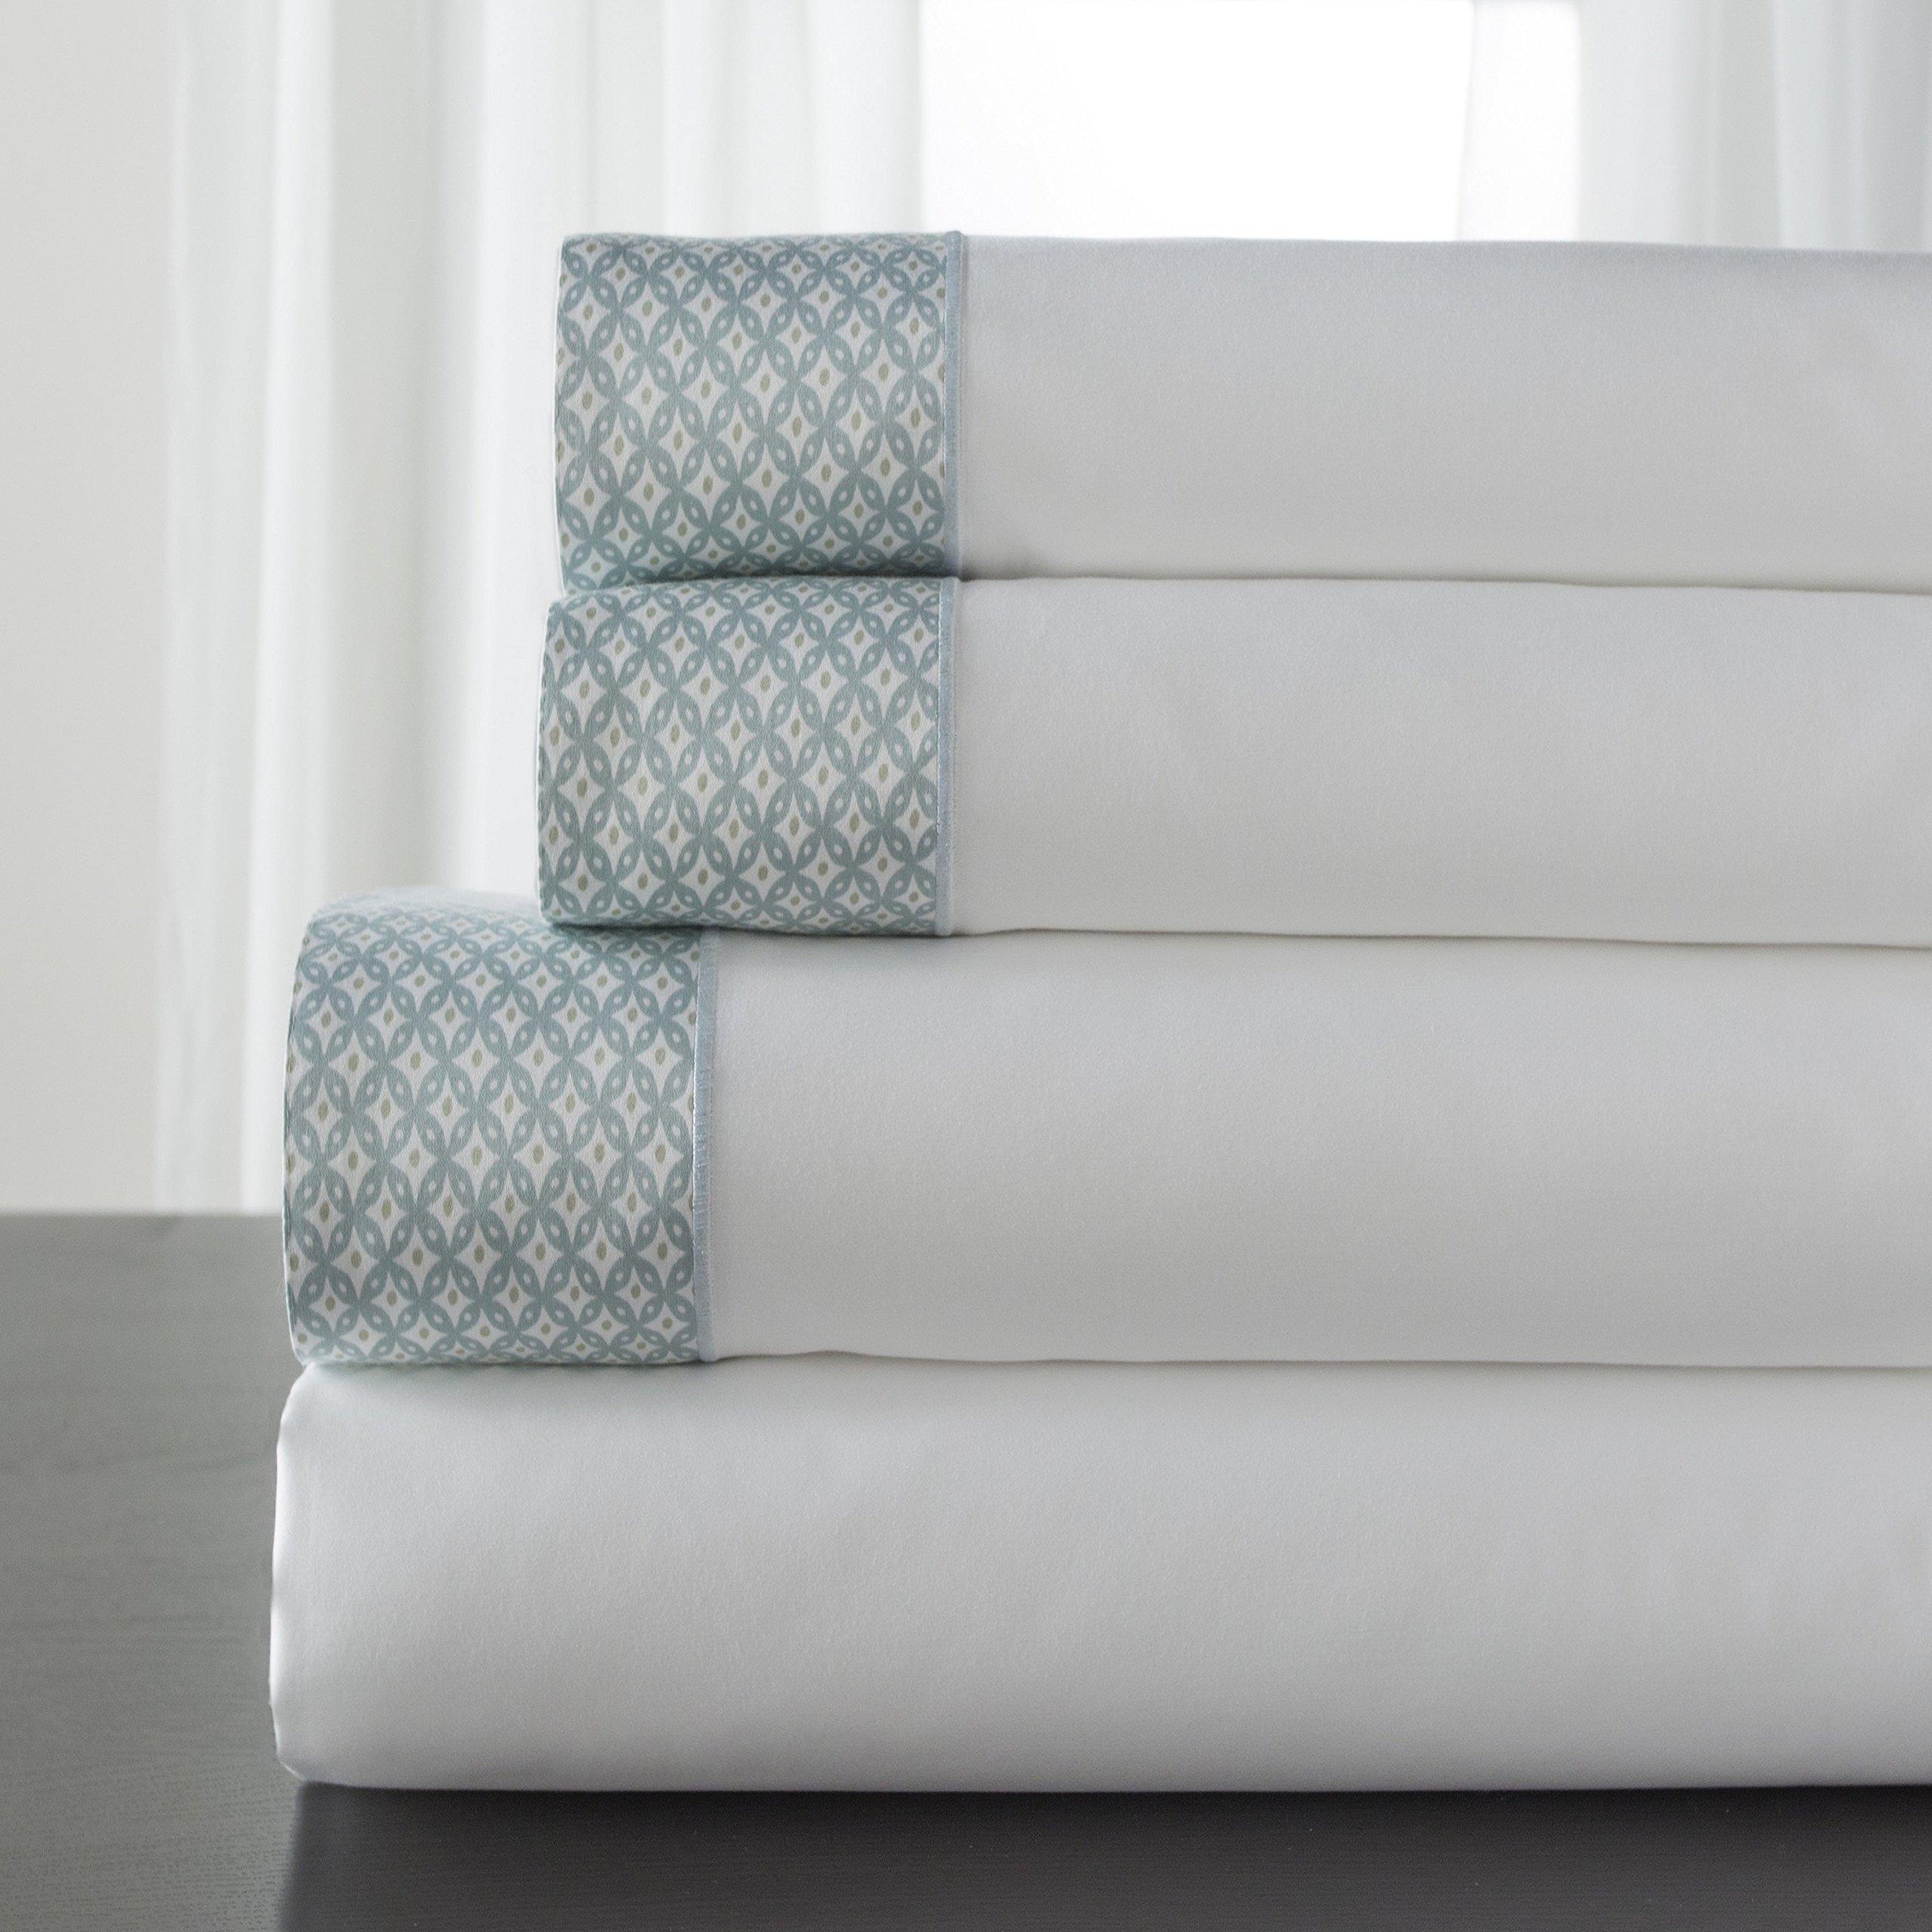 Elite Home Products Adara 400-Thread Count Sheet Set Spa California King Sheet Set